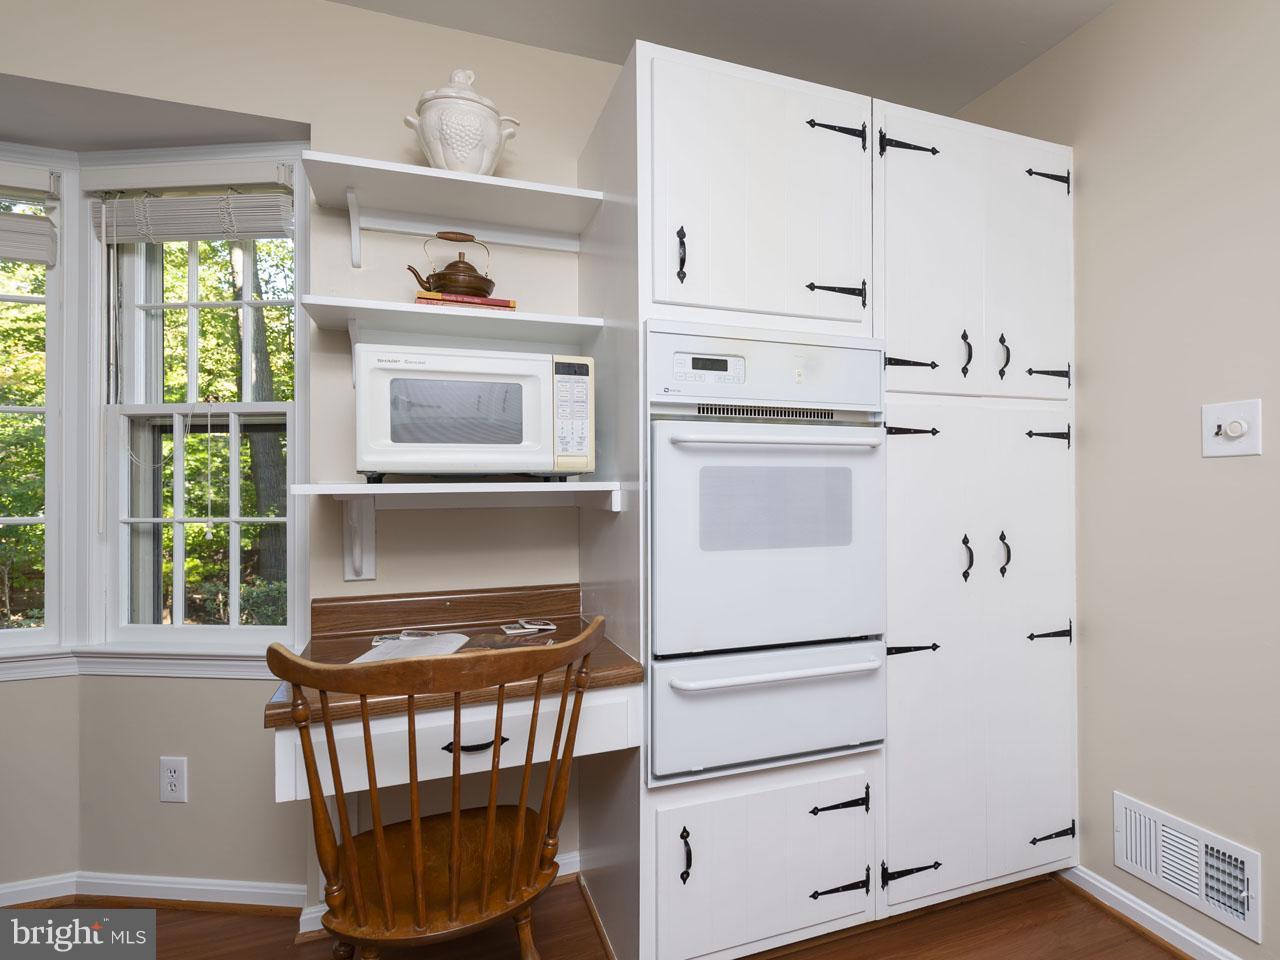 1010014728-300953032581-2021-09-05-13-50-26  |   | Annandale Delaware Real Estate For Sale | MLS# 1010014728  - Best of Northern Virginia